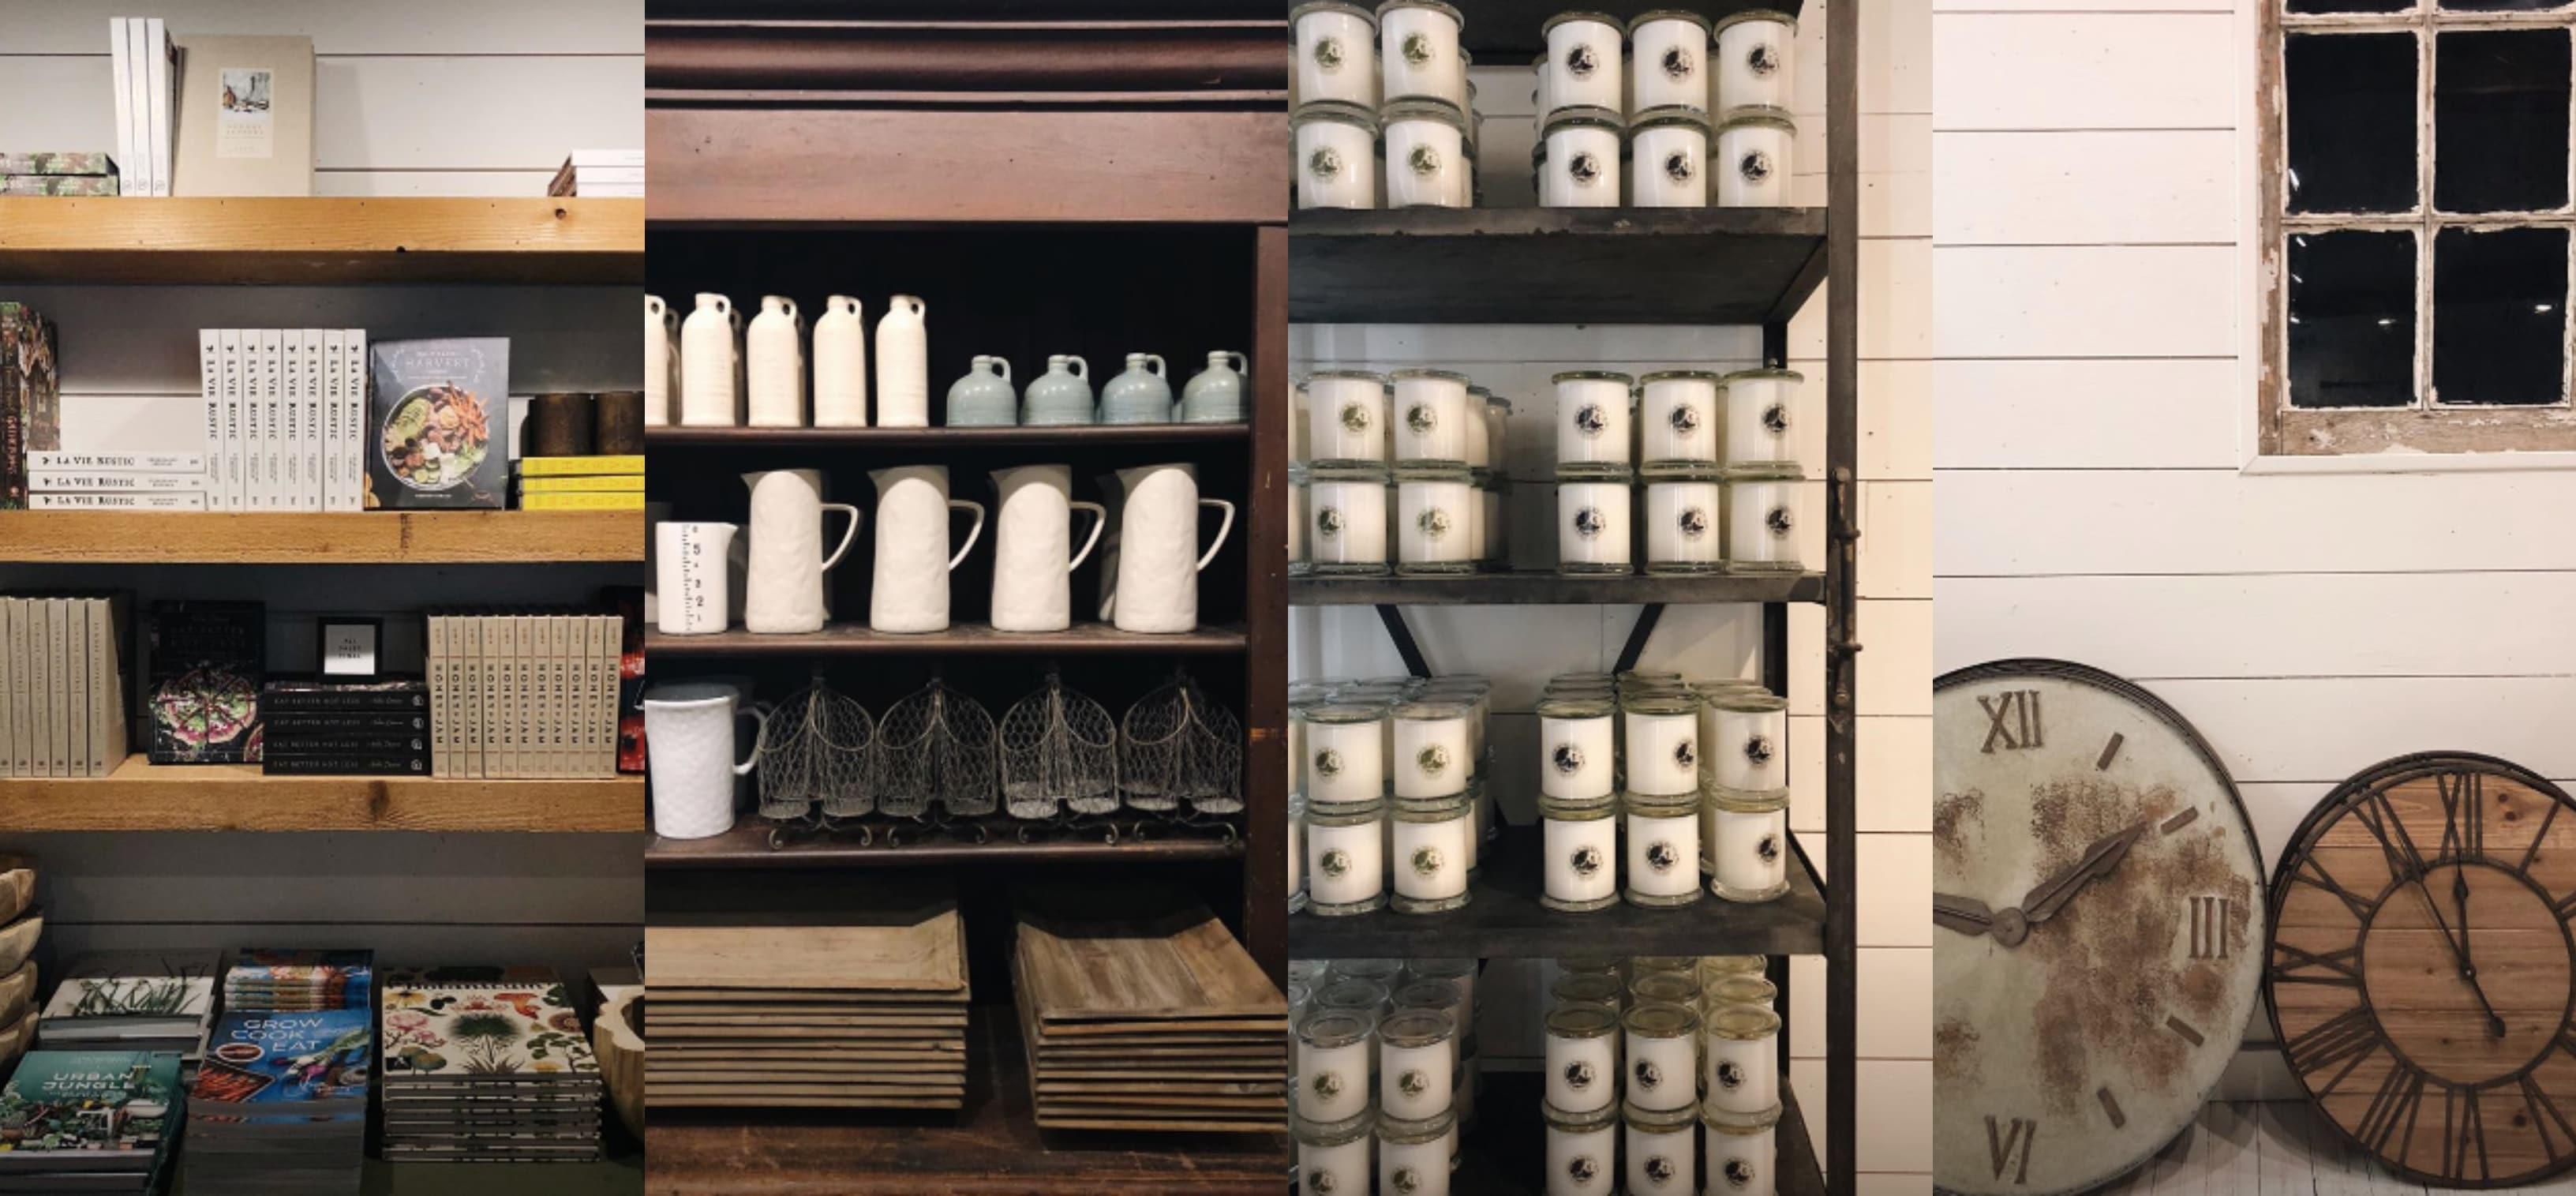 Magnolia Warehouse Shop items for sale